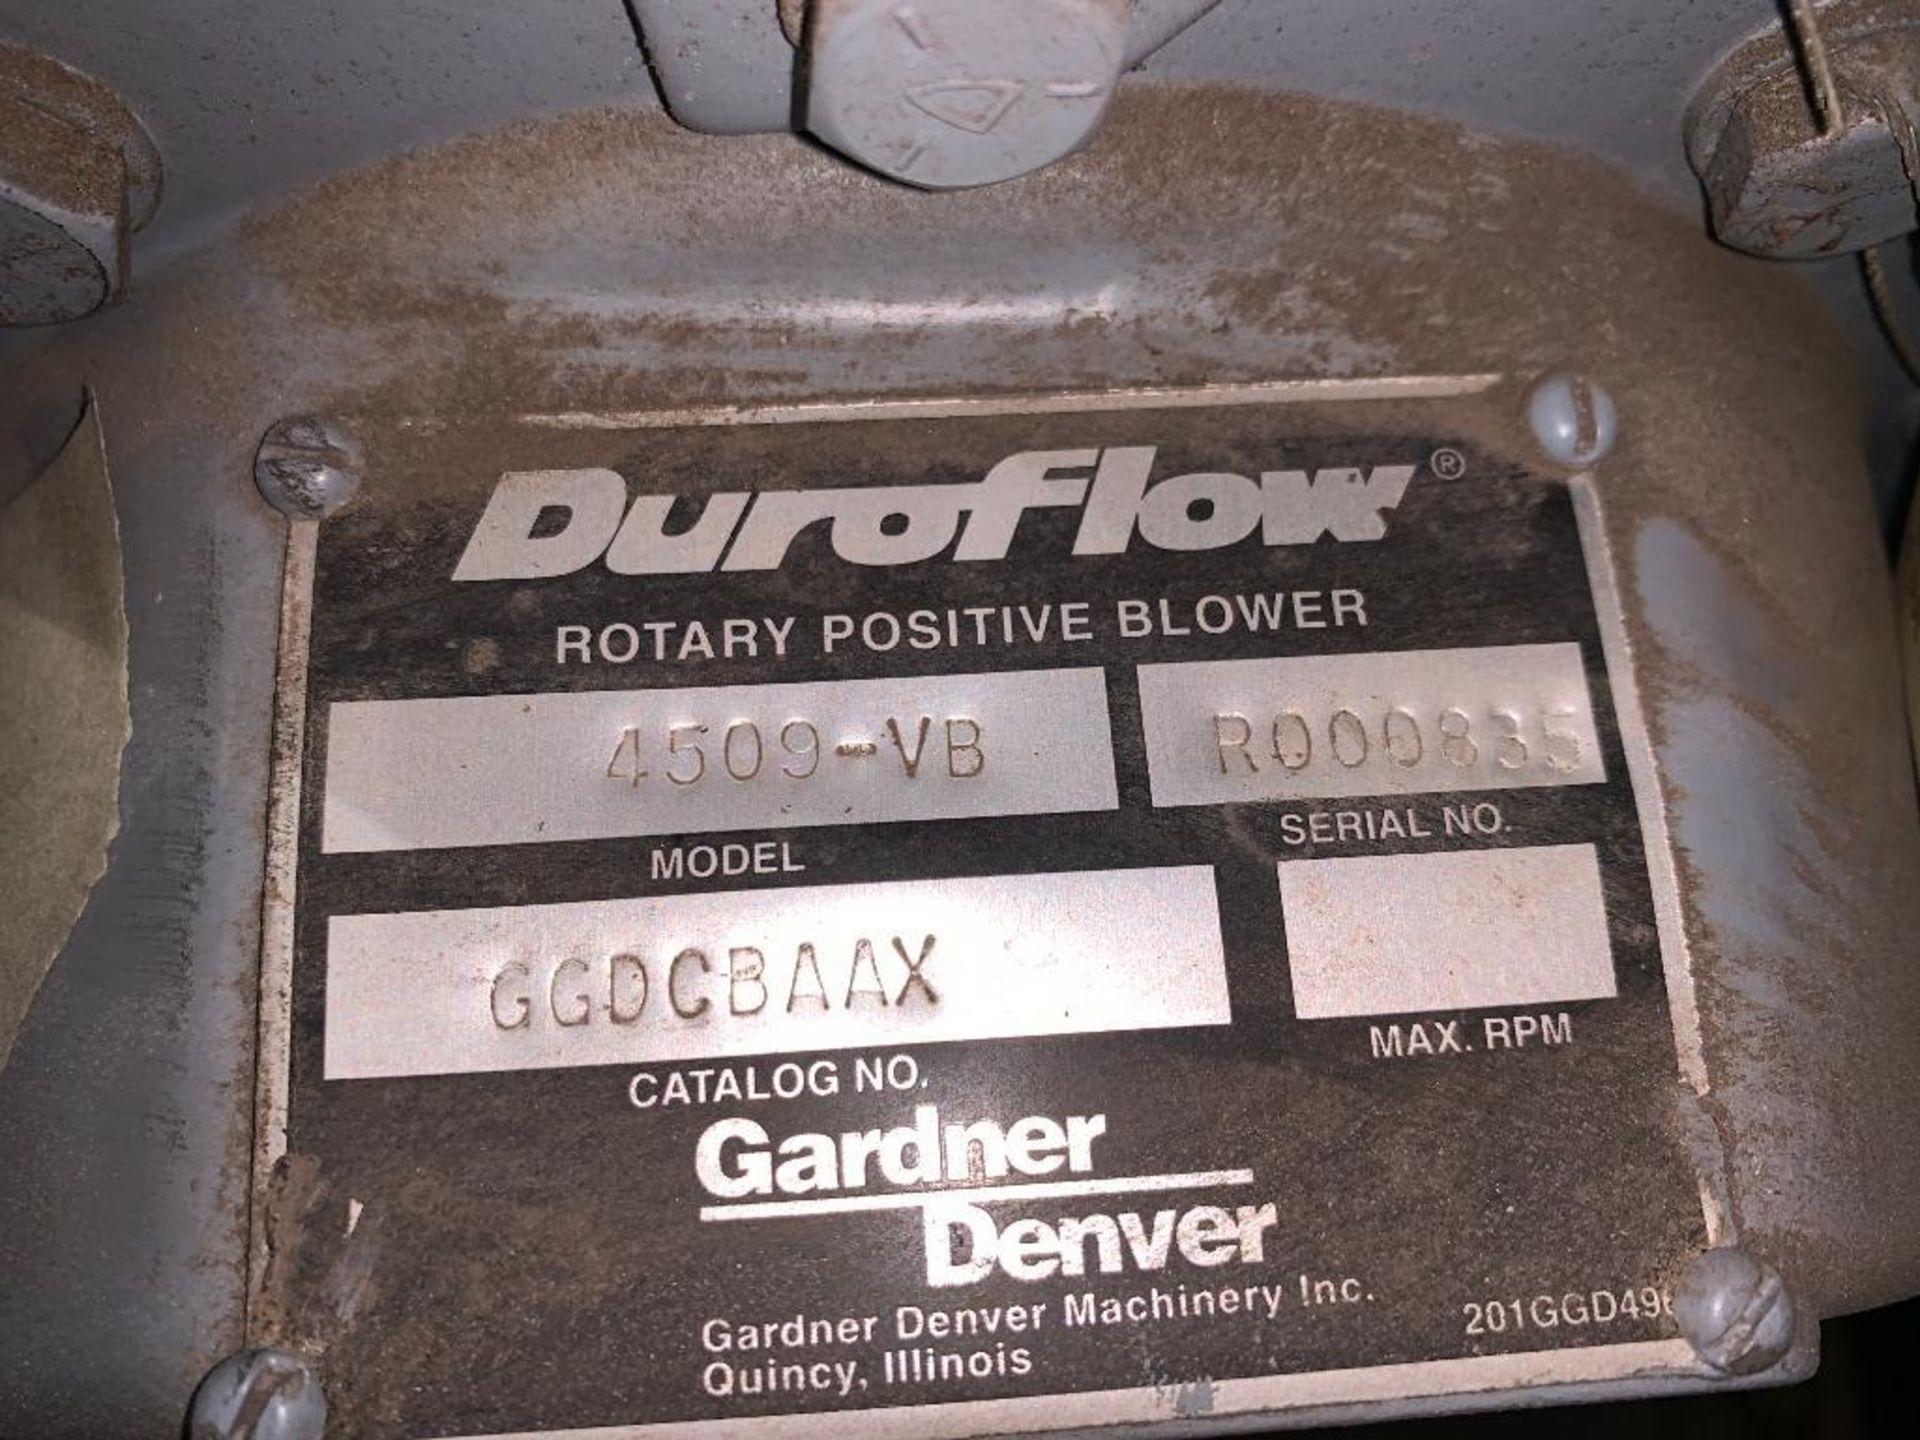 Gardner Denver Duroflow blower - Image 2 of 3